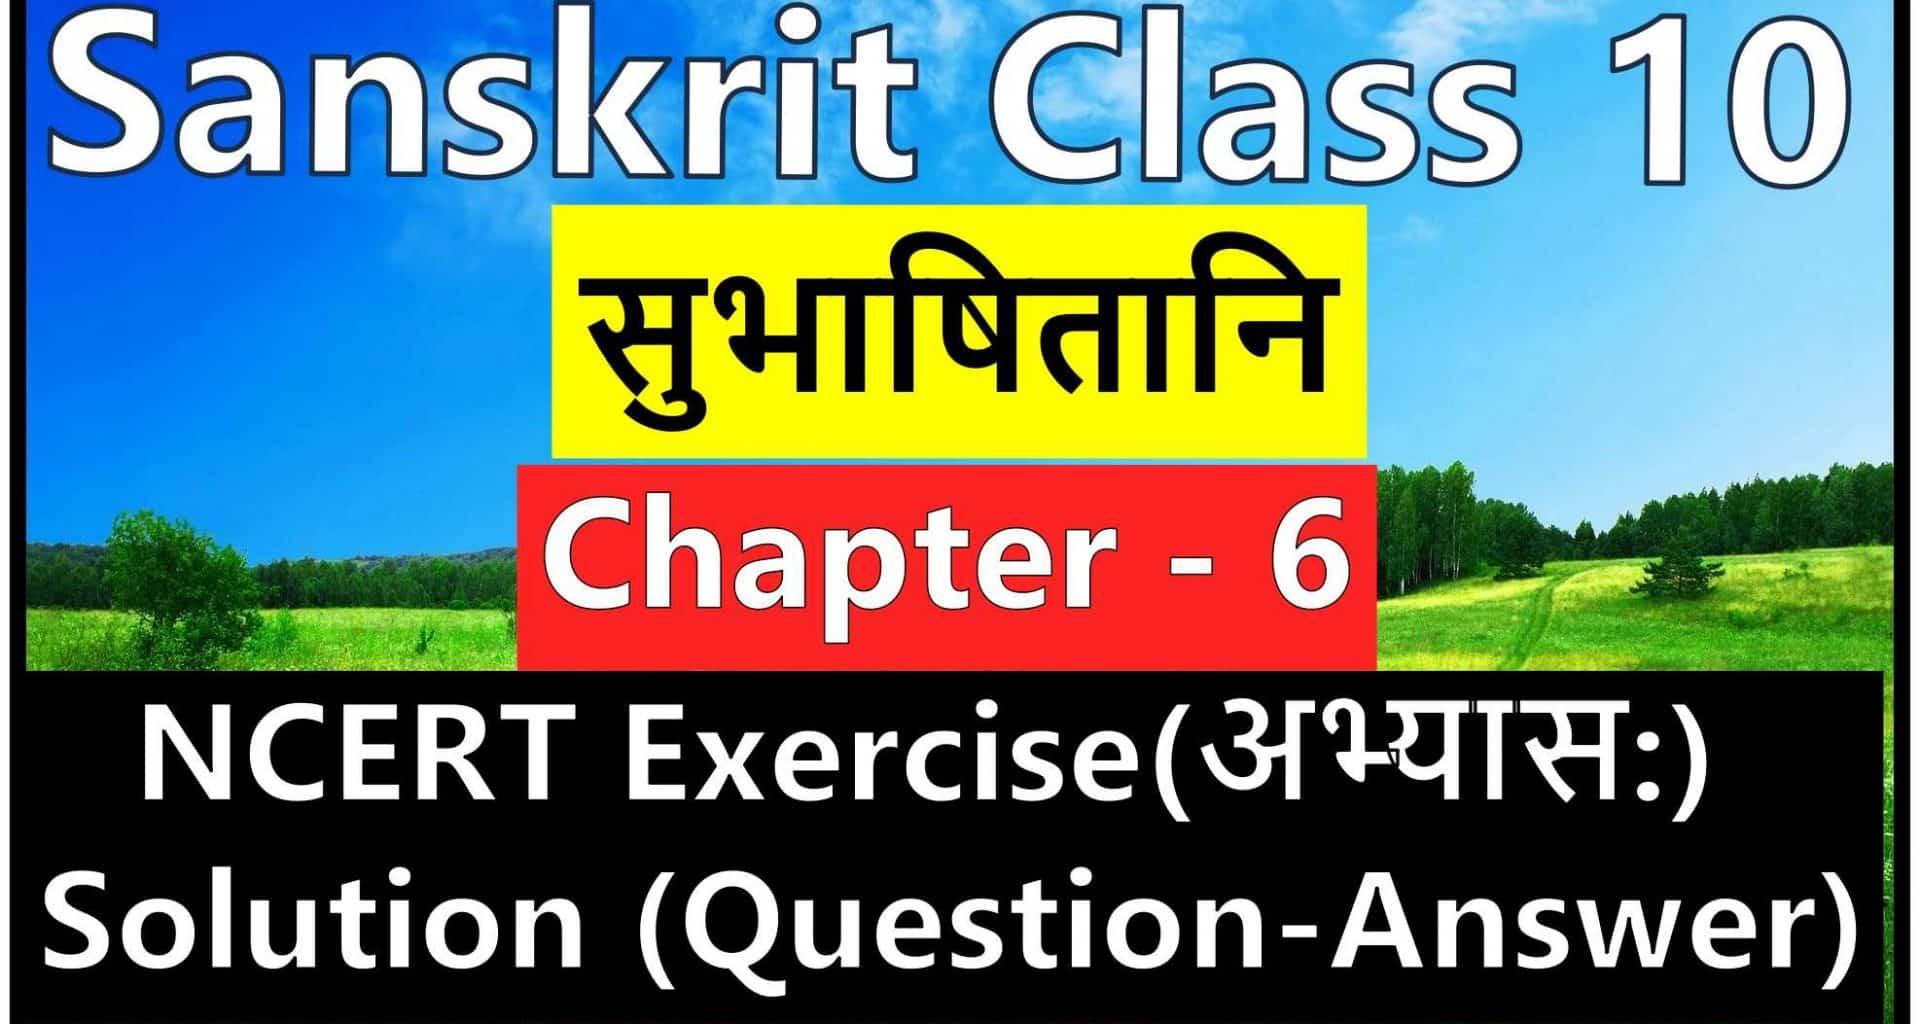 Sanskrit Class 10 - Chapter 6 - सुभाषितानि- NCERT Exercise Solution (Question-Answer)